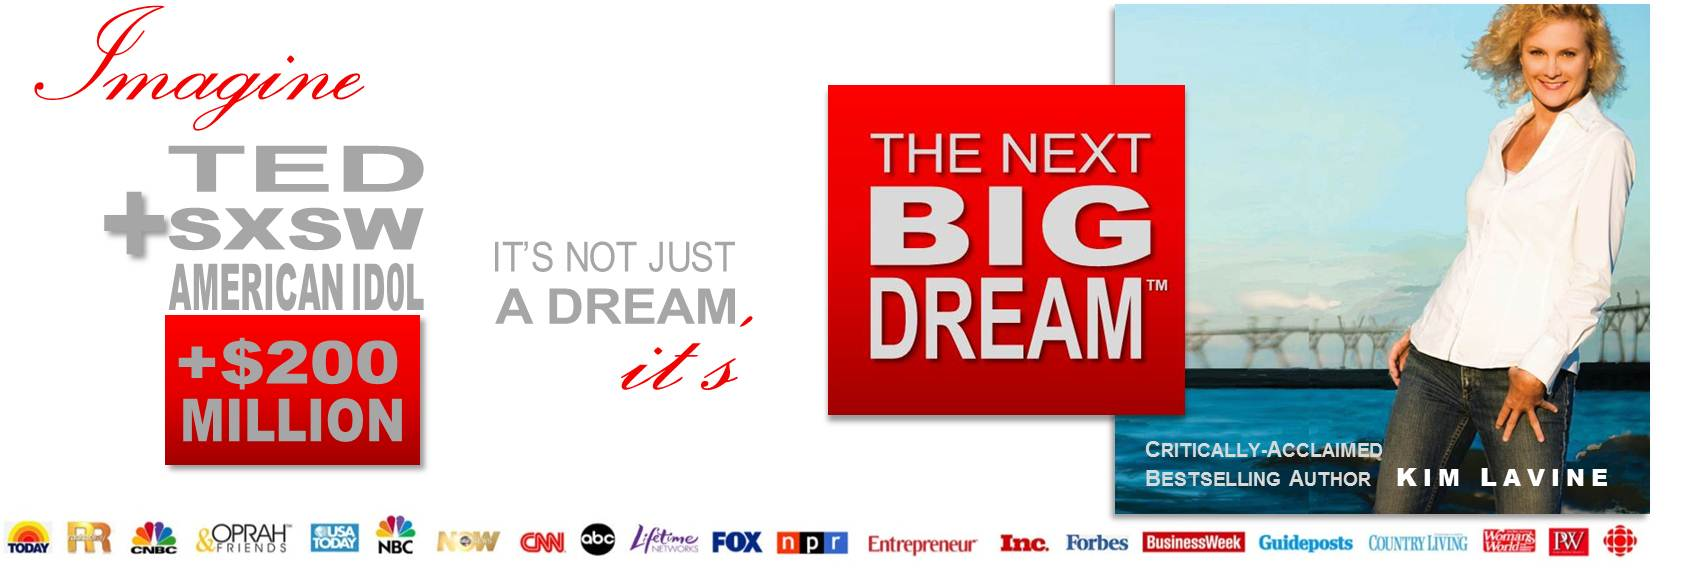 THE NEXT BIG DREAM header Kim Lavine.jpg